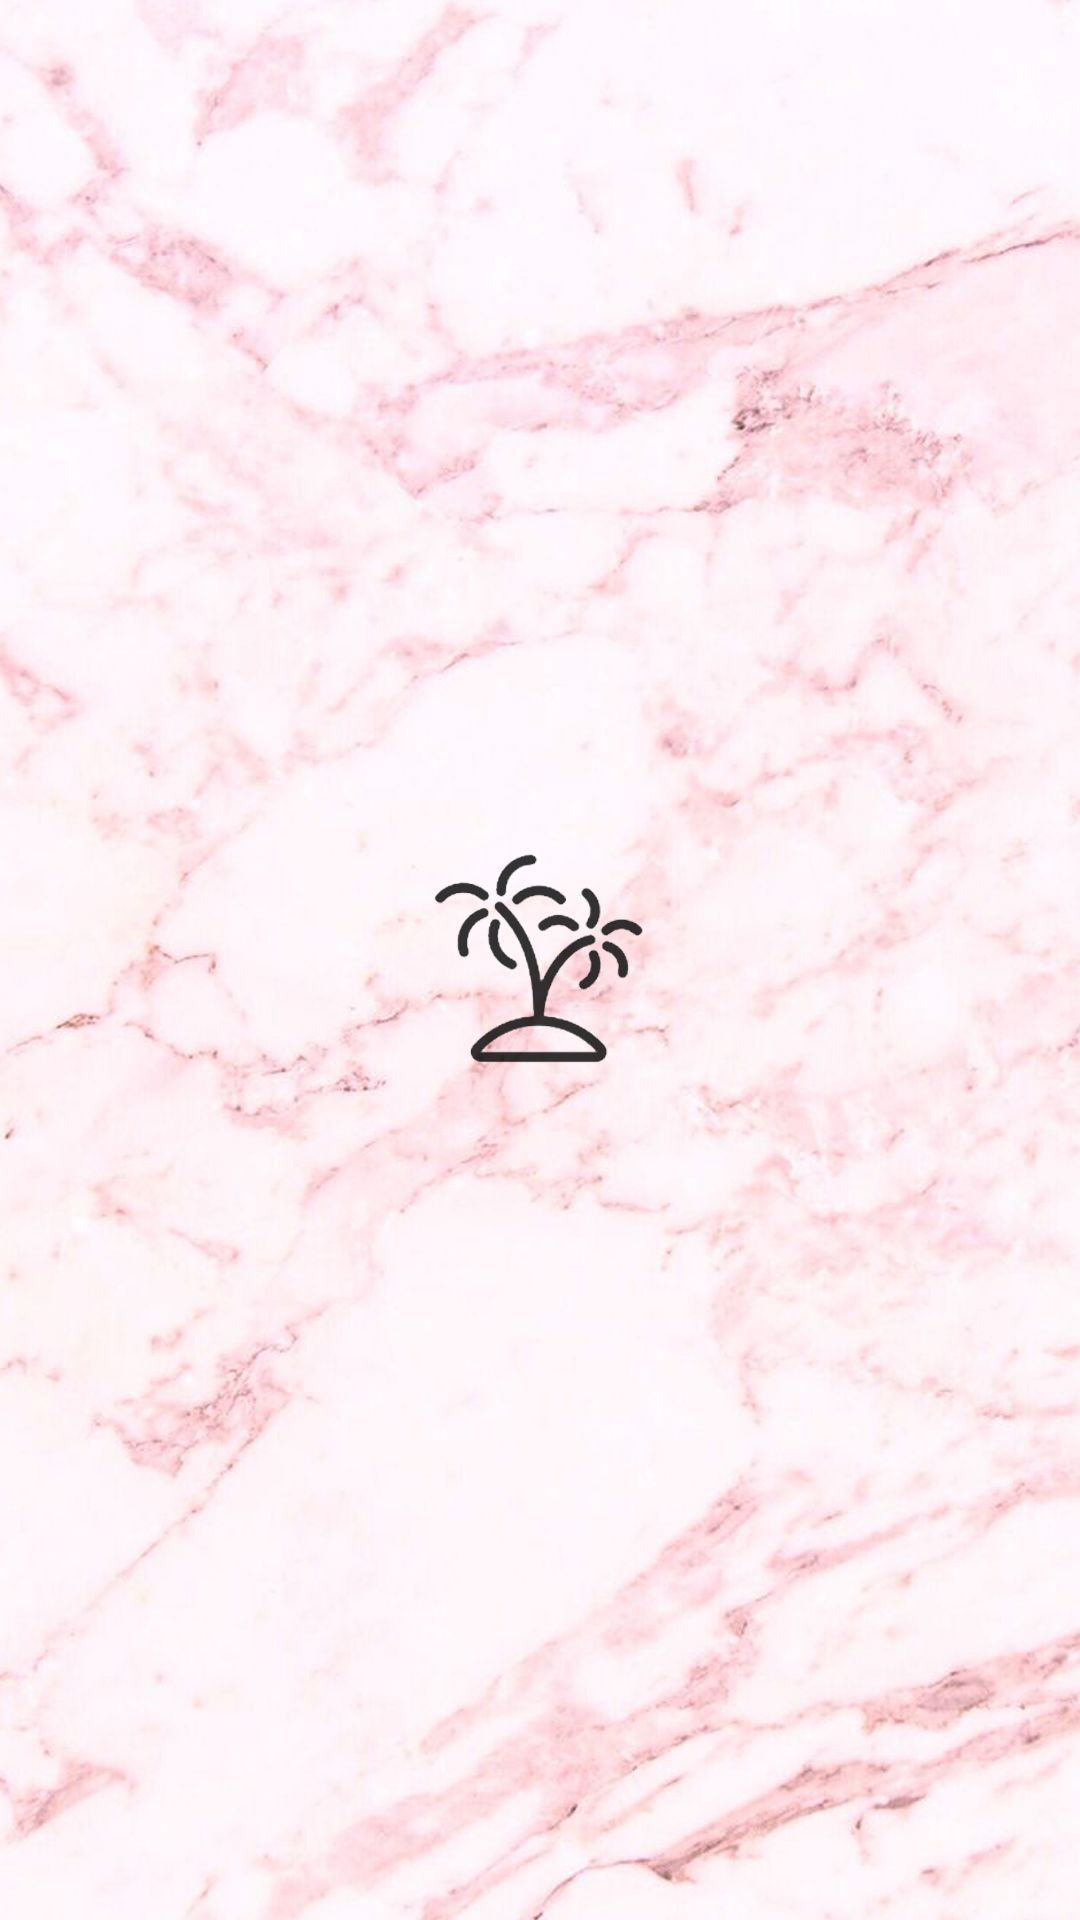 Summer Break 2019 Instagram pictogrammen, Tumblr